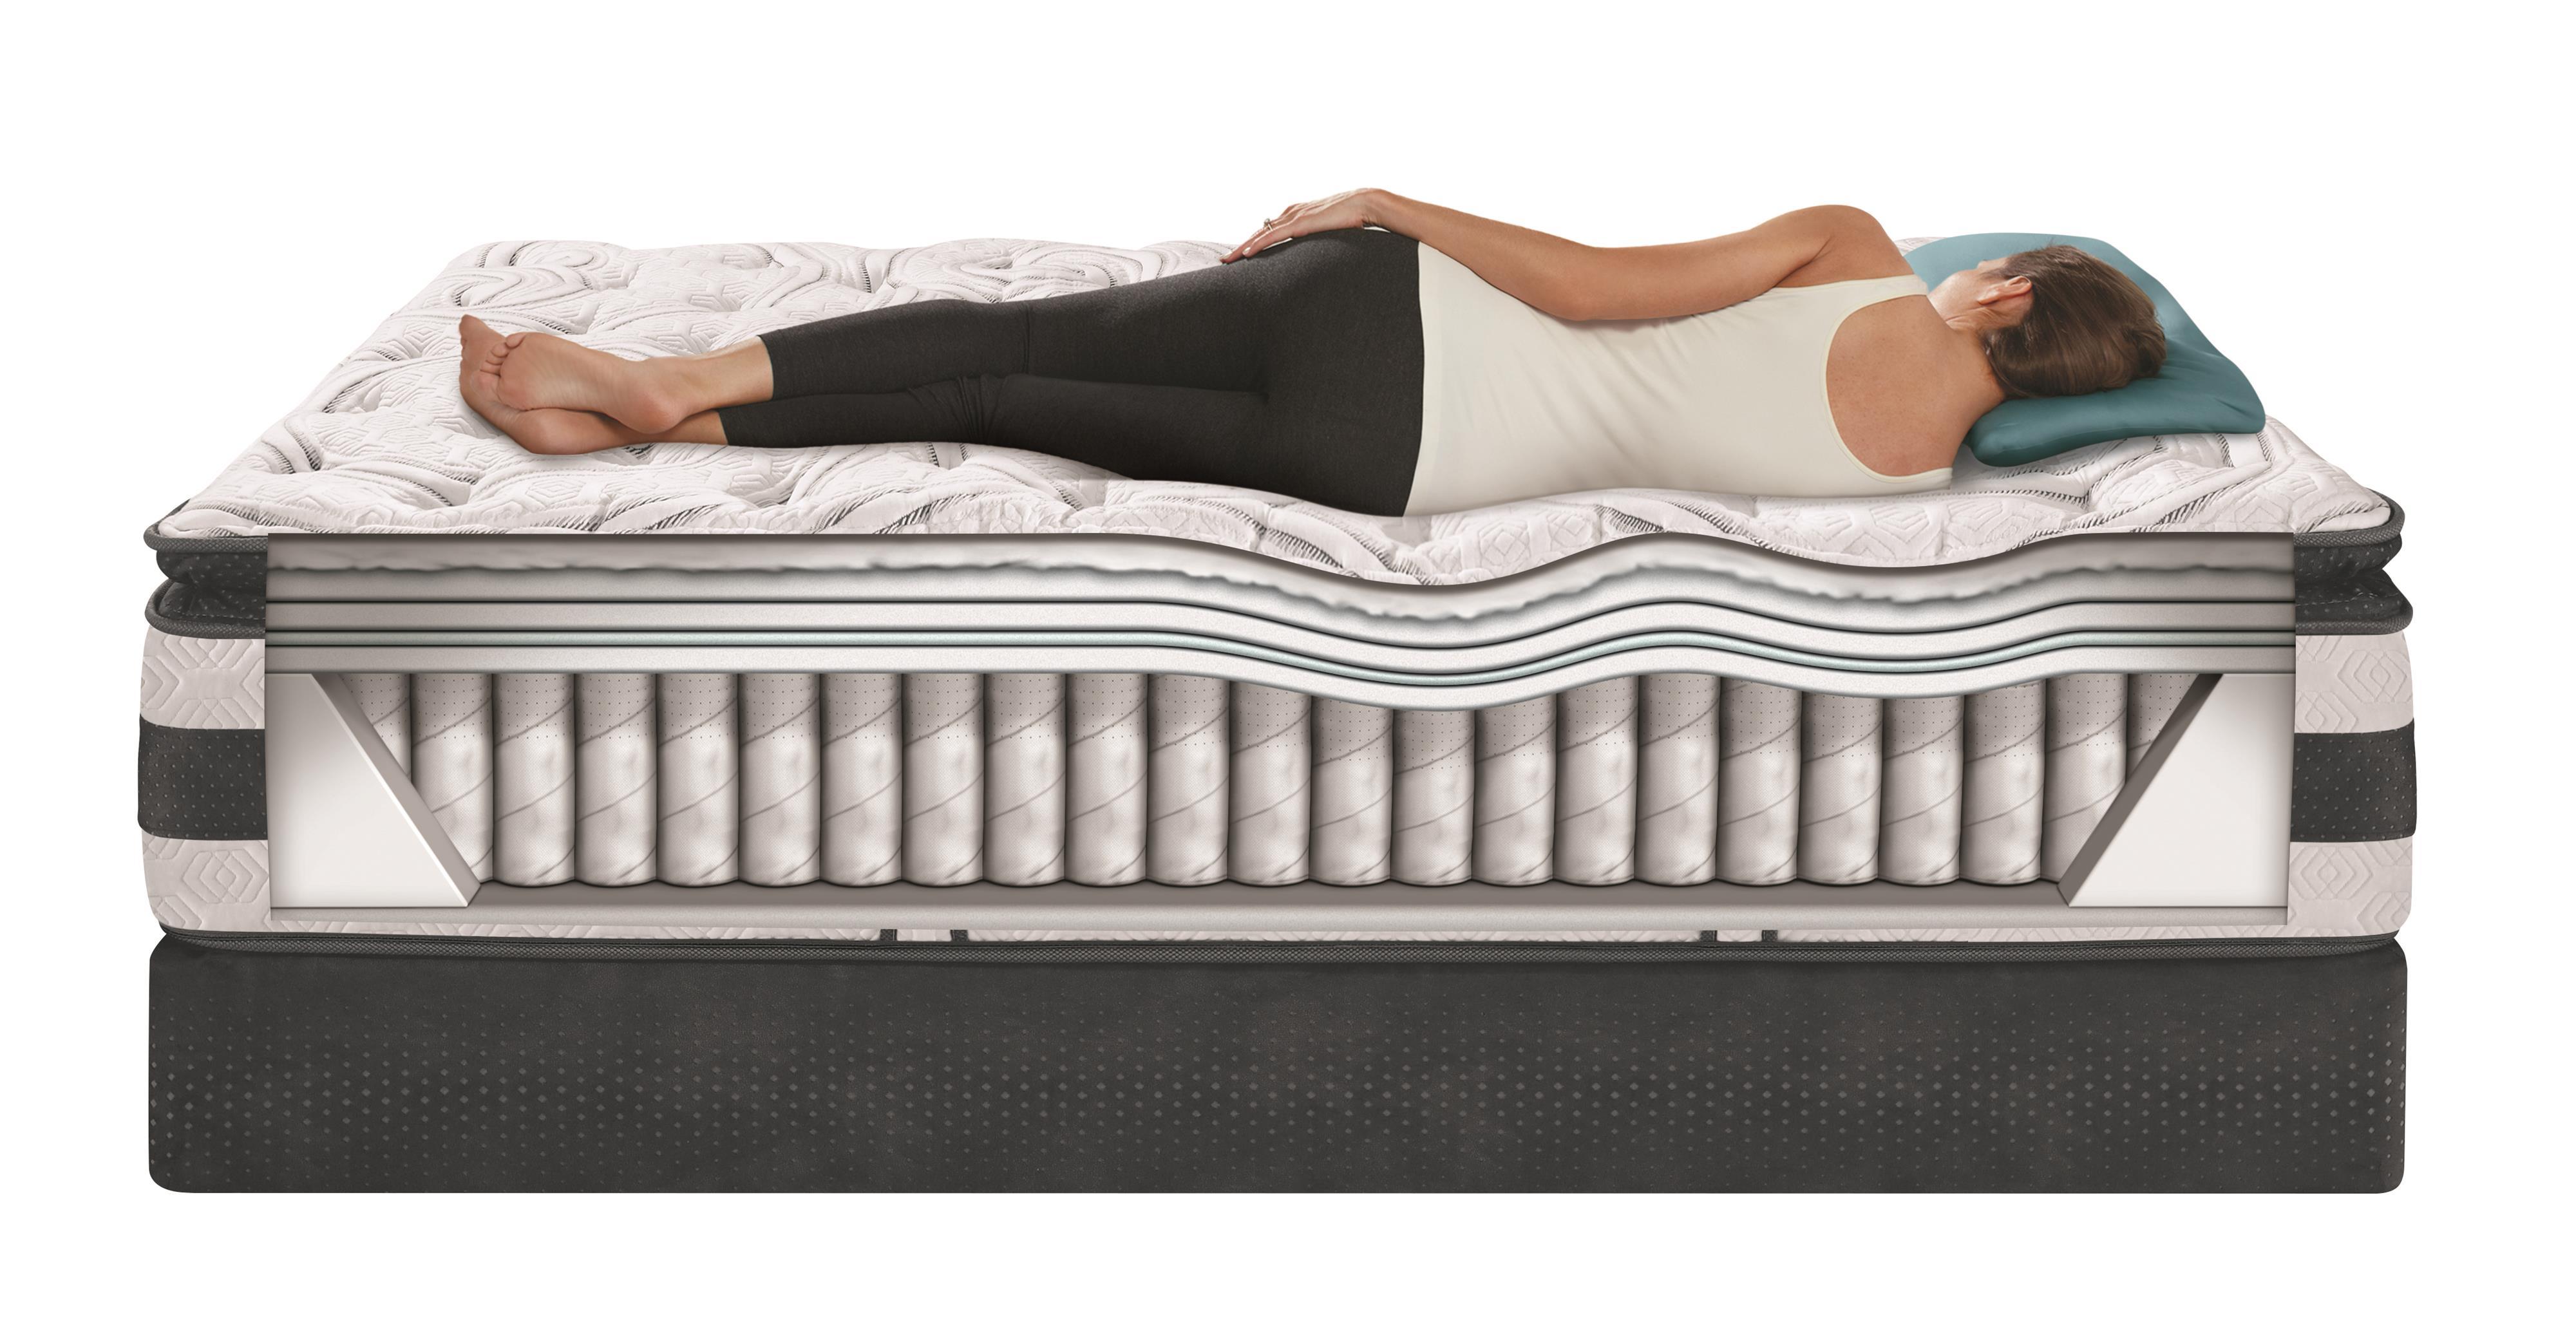 Serta Icomfort Hybrid Observer Queen Super Pillow Top